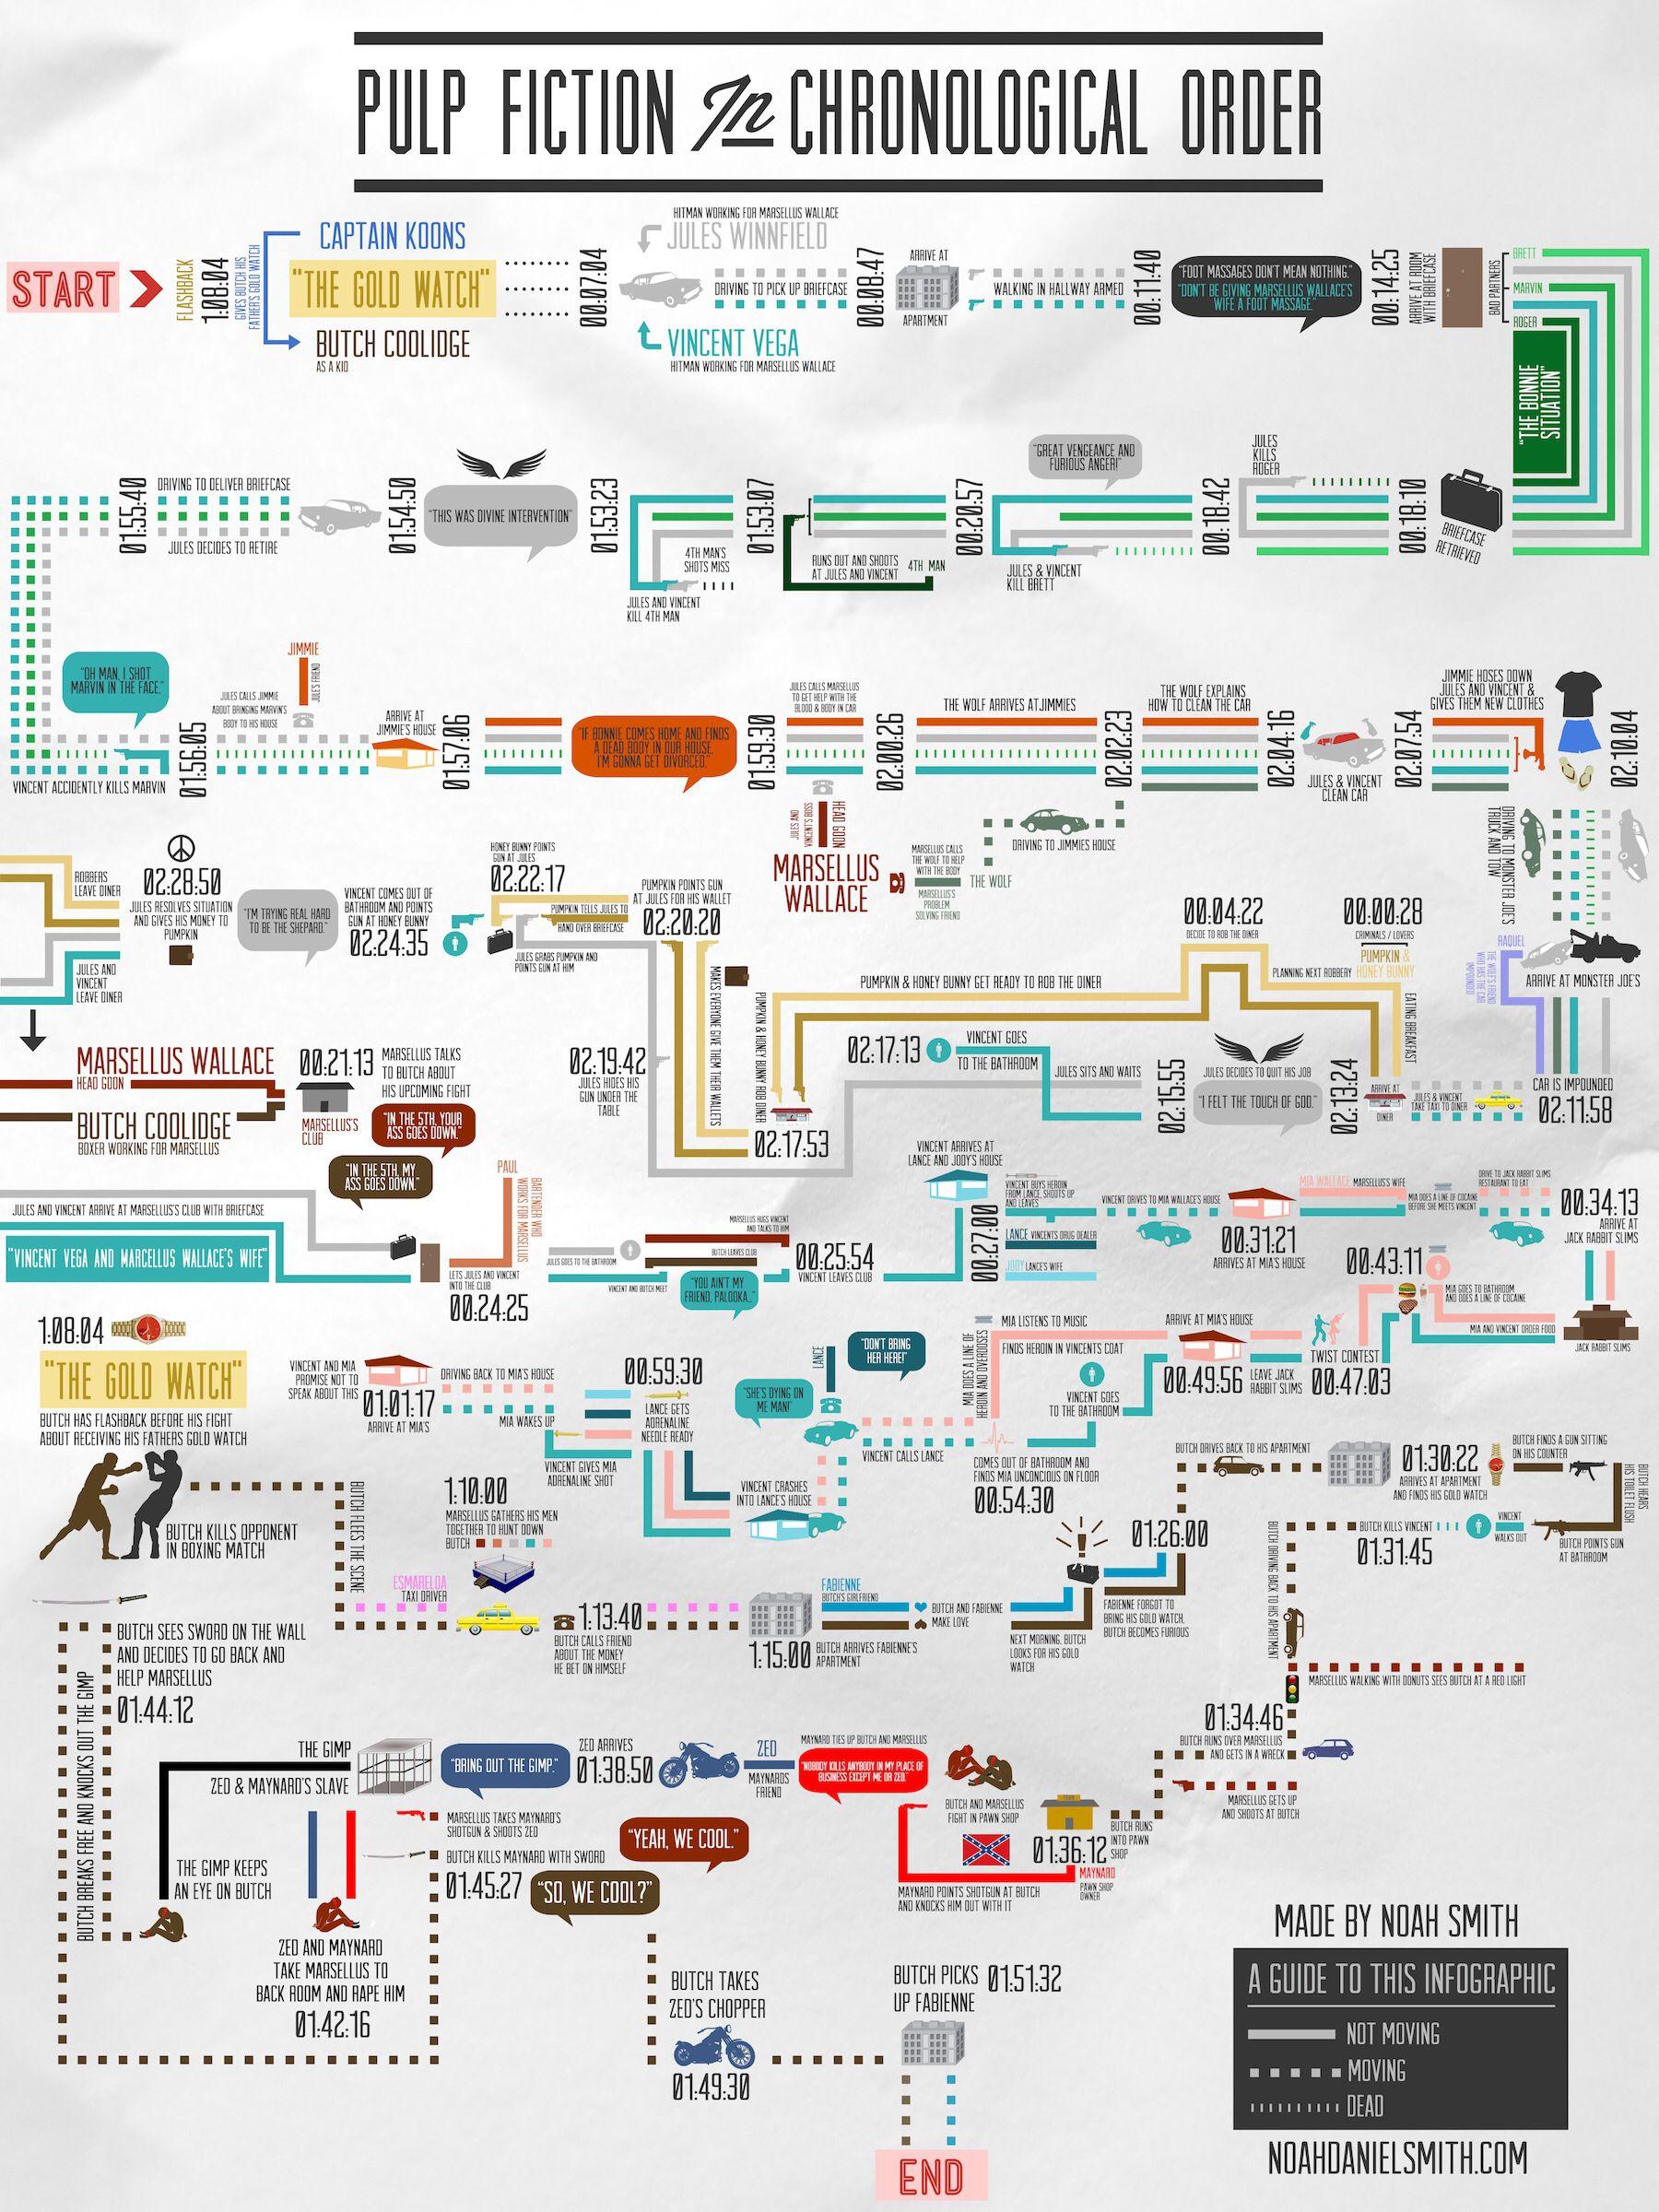 Image from http://visually.visually.netdna-cdn.com/PulpFictioninChronologicalOrder_4fab4571757f2.jpg.